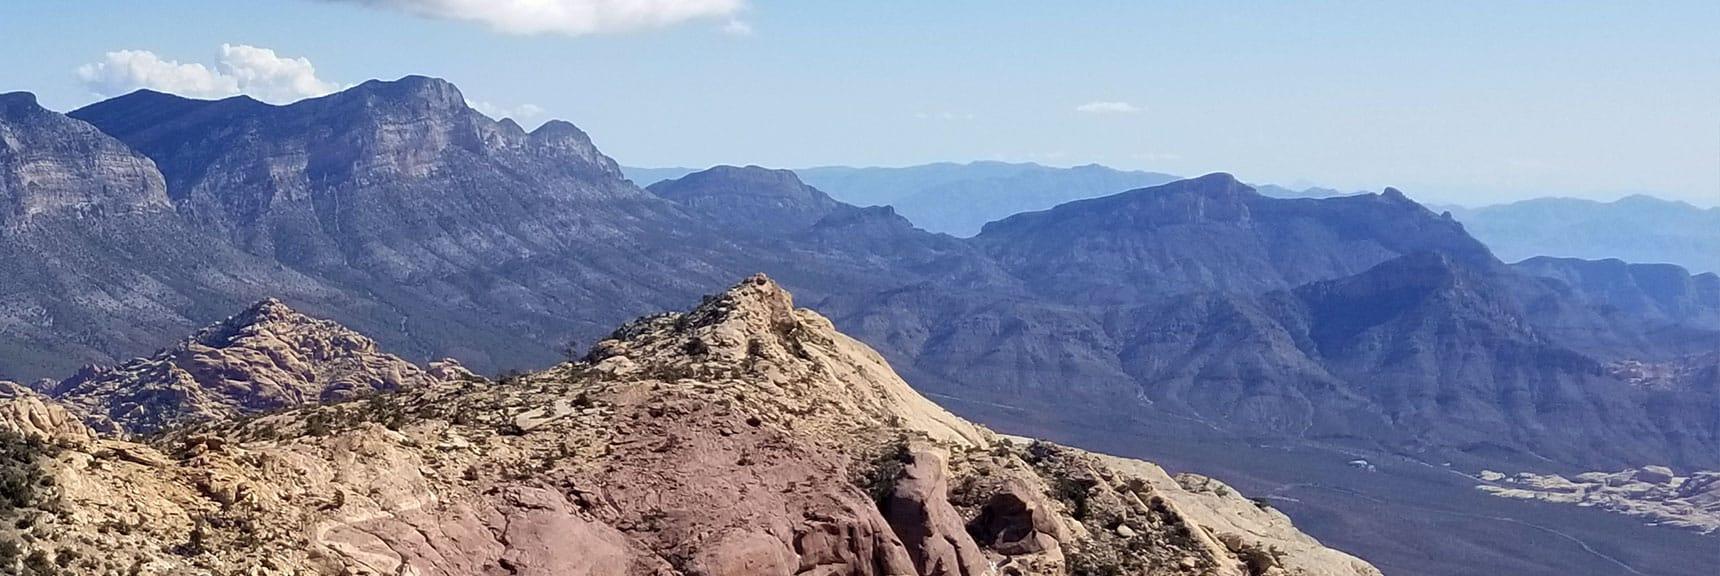 Turtlehead Peak, Damsel Peak and La Madre Mountain Viewed from Piedmont Ridge Approach to Goat Rock/North Peak